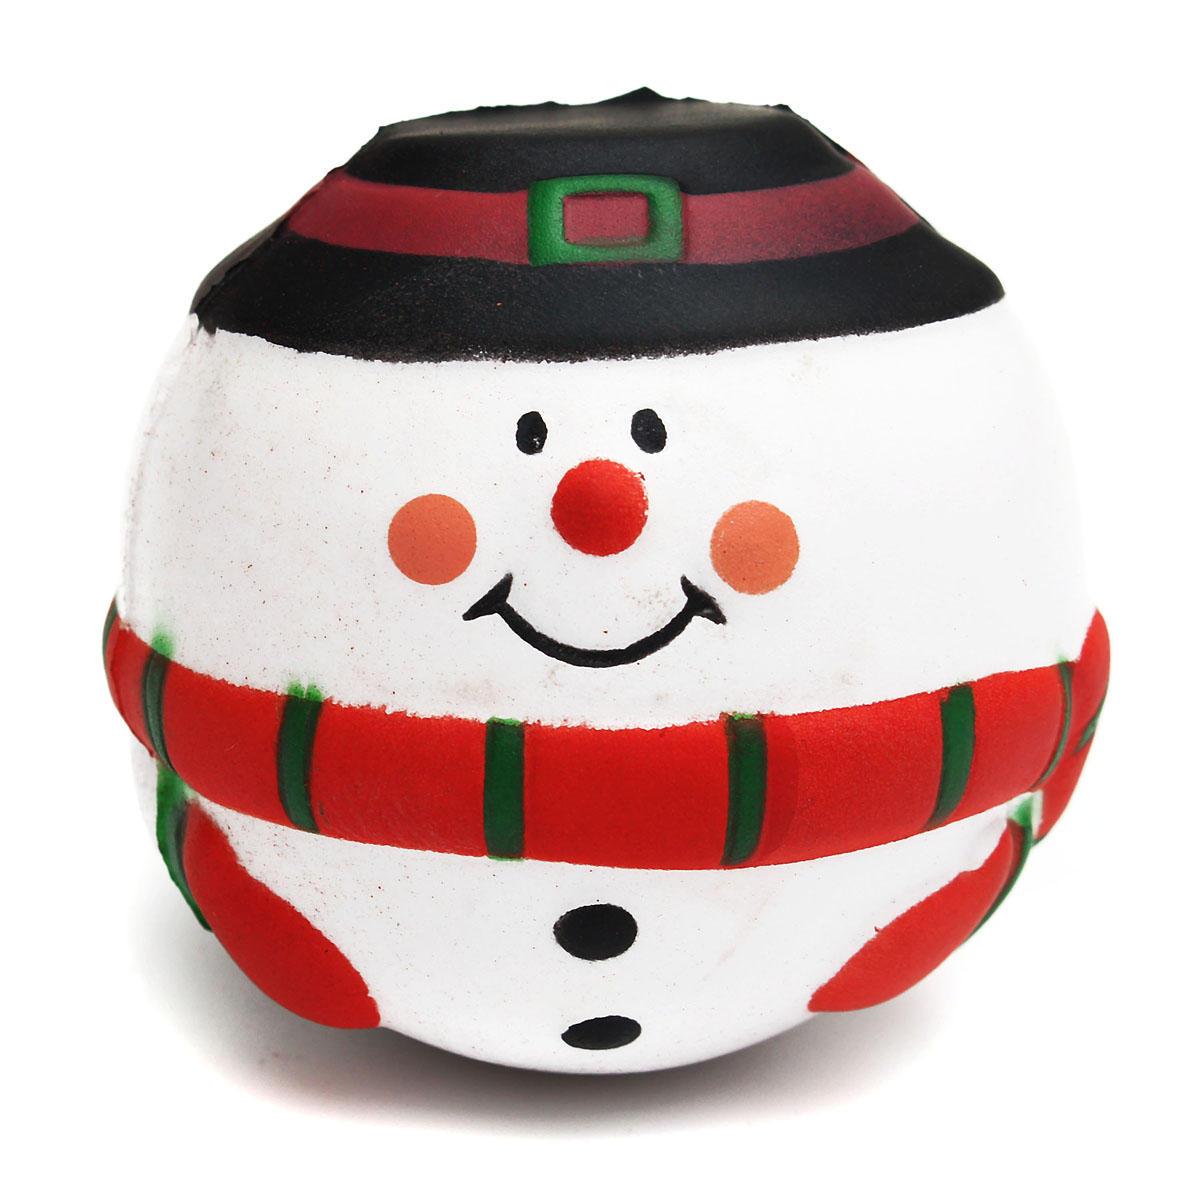 Baby Kid Toy PU High Elasticity Ball Developmental Early Fun Educational Cartoon Snowman Christmas Decor Gifts